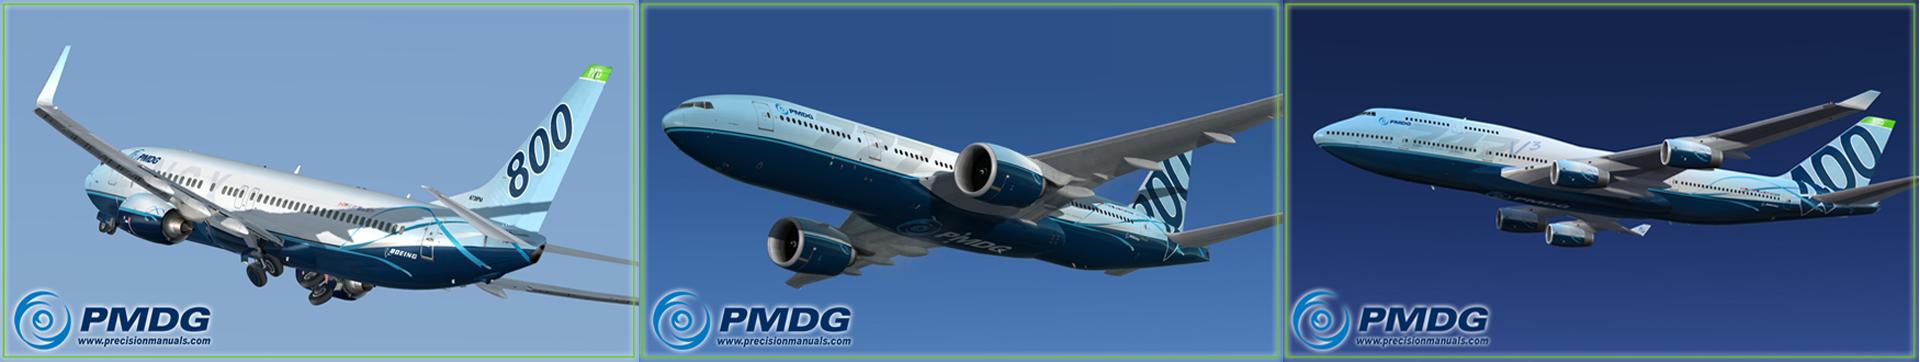 x-plane] Does PMDG Need X-Plane More Than X-Plane Needs PMDG